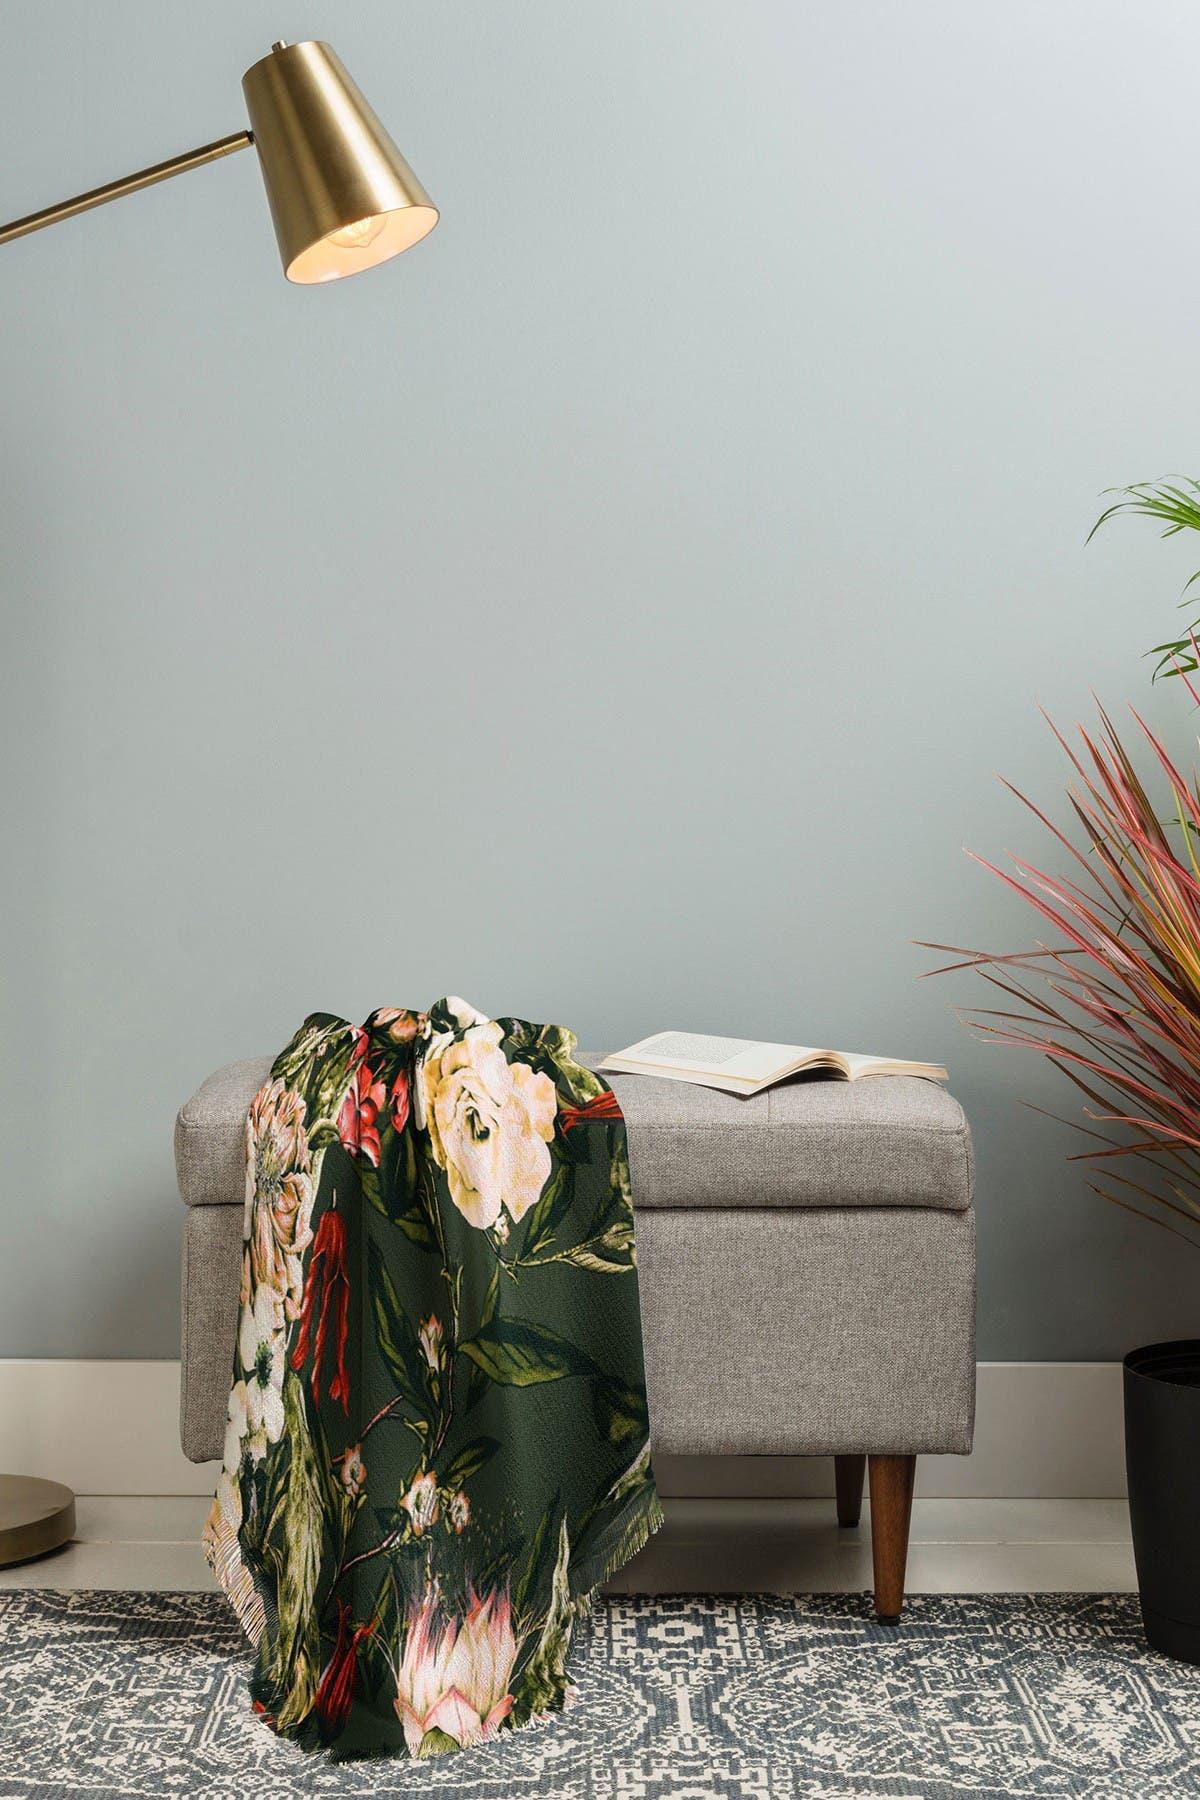 Image of Deny Designs Marta Barragan Camarasa Dark Wild Floral 03 Woven Throw Blanket